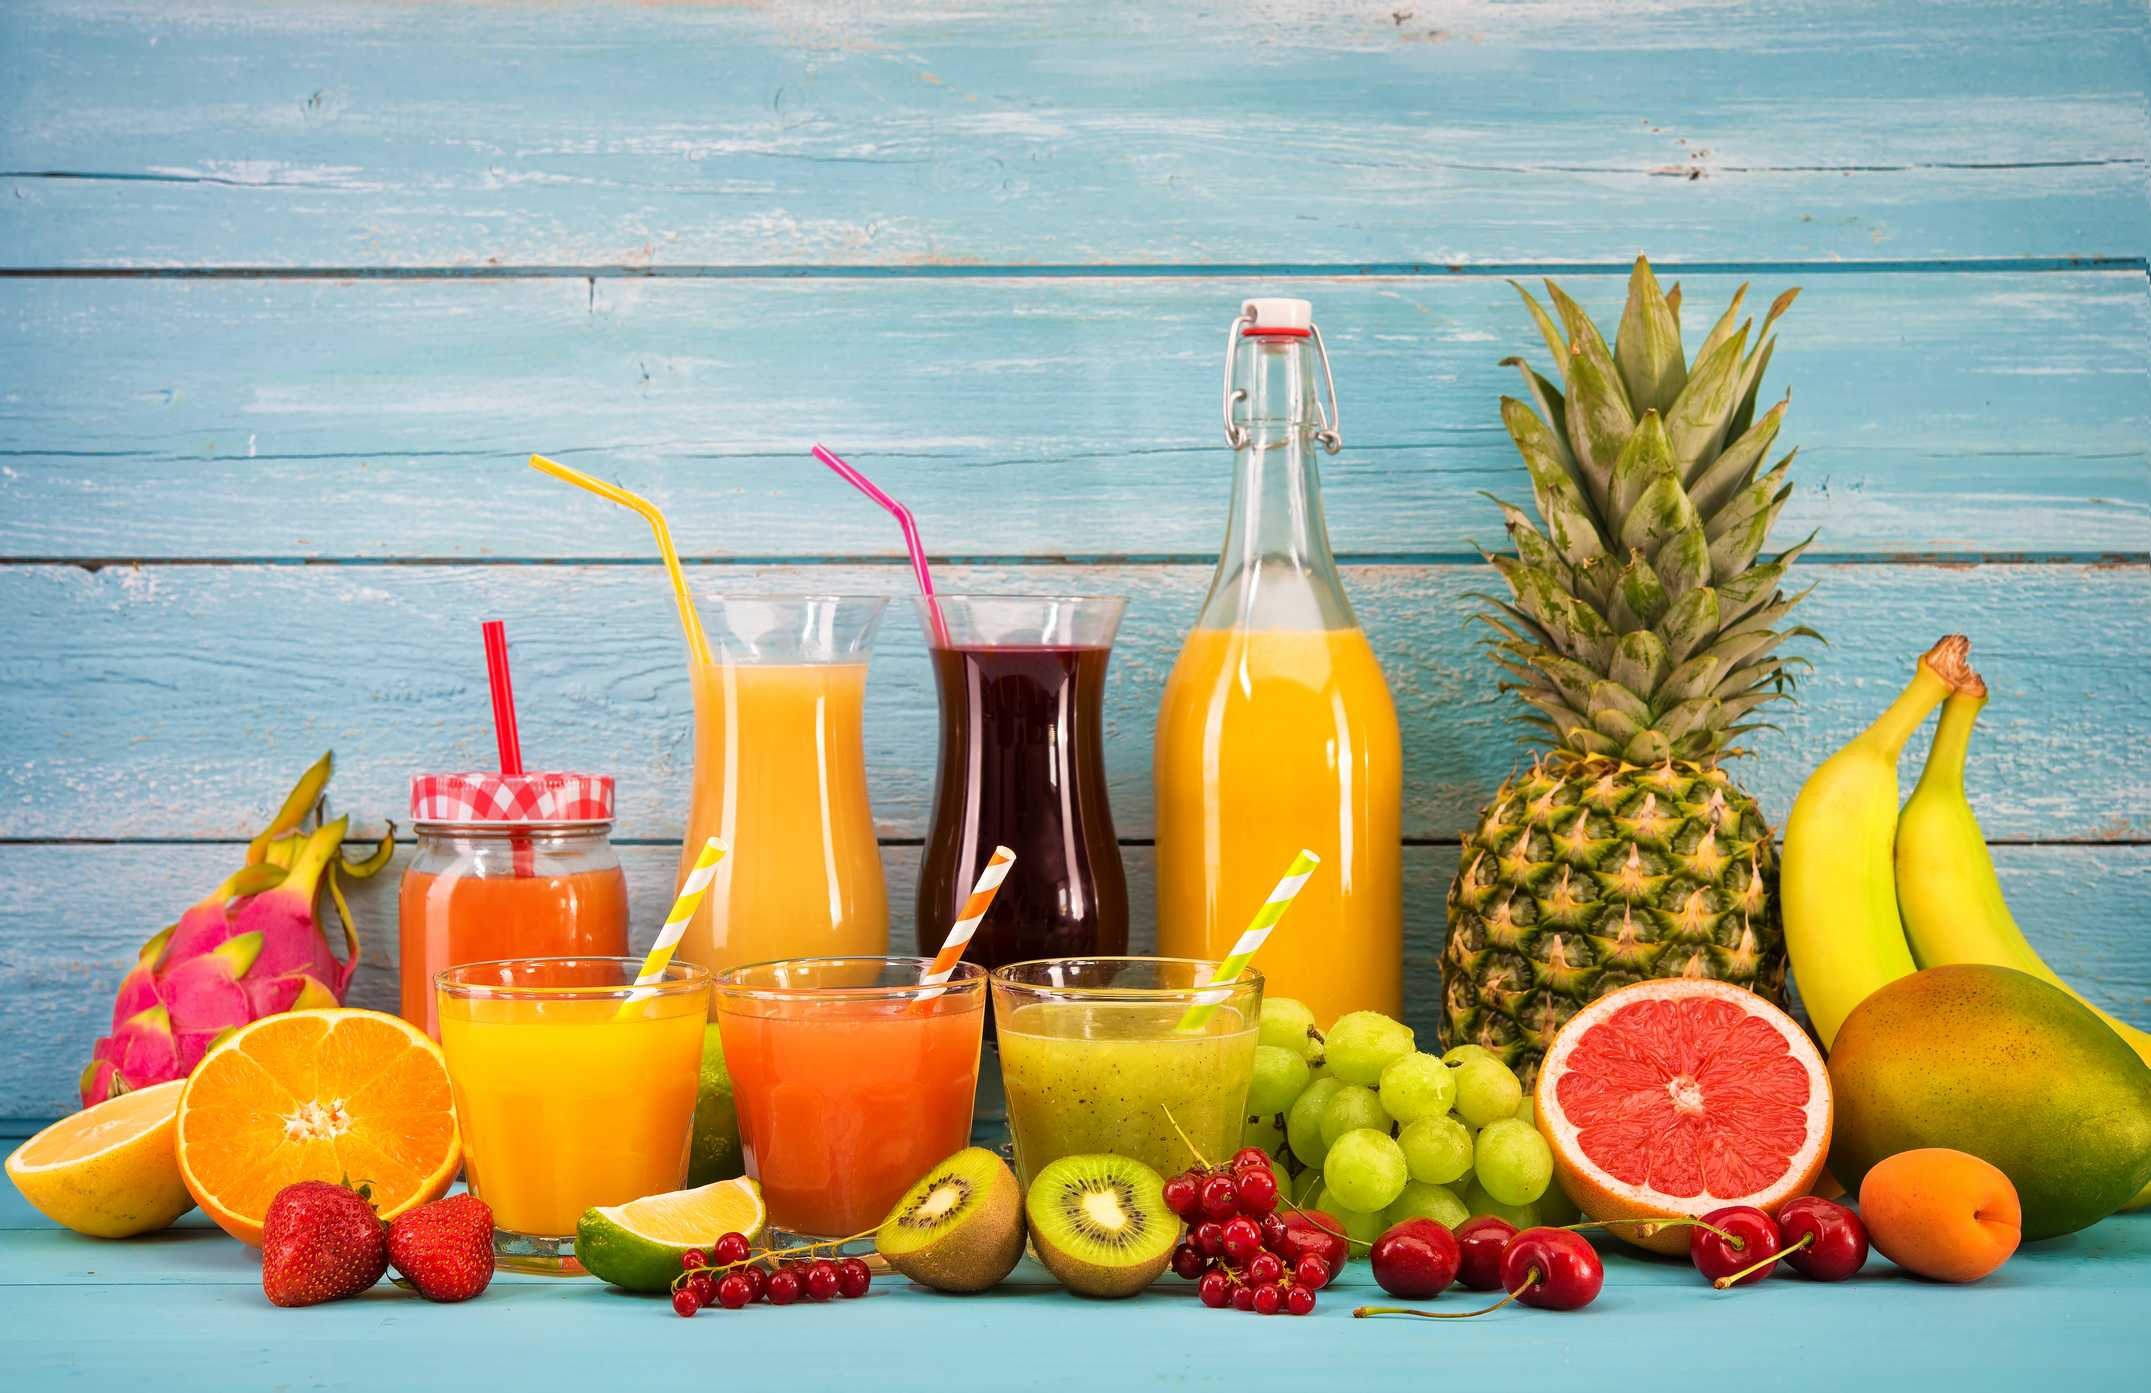 Fruit Juice and Diabetes - What Juice Can Diabetics Drink